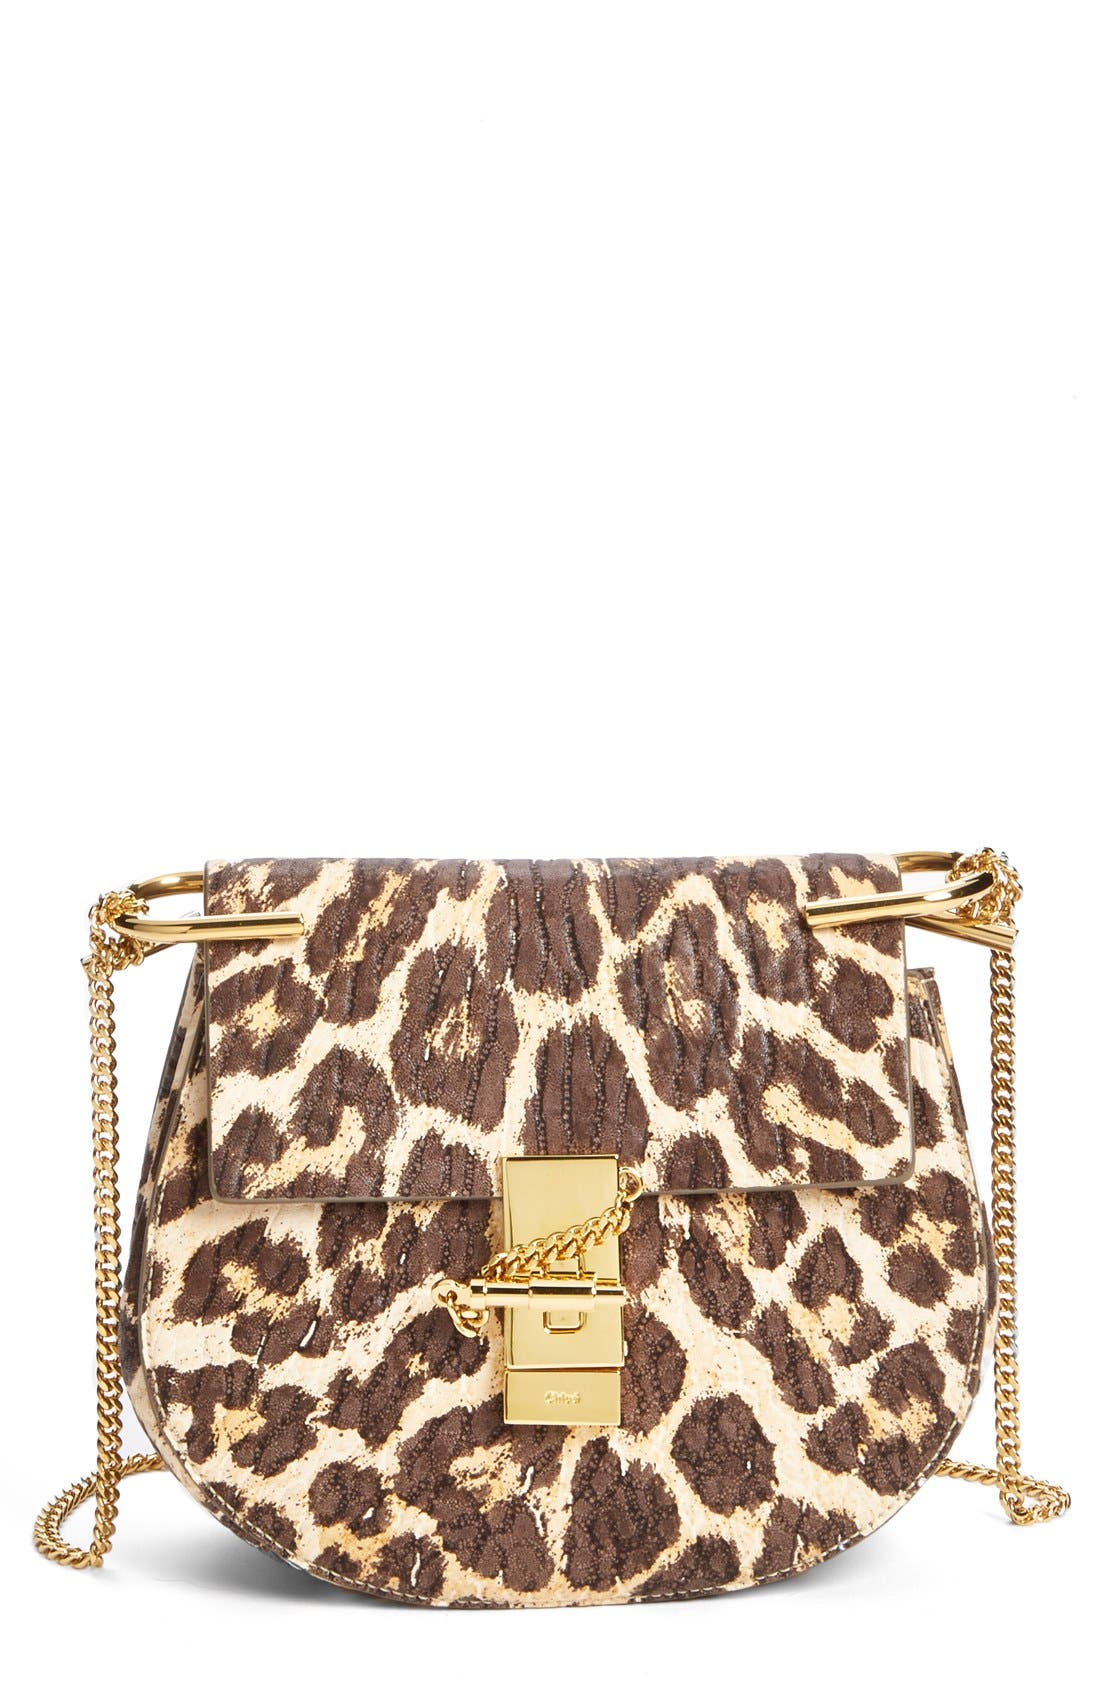 Main Image - Chloé 'Drew' Leopard Print Leather Shoulder Bag